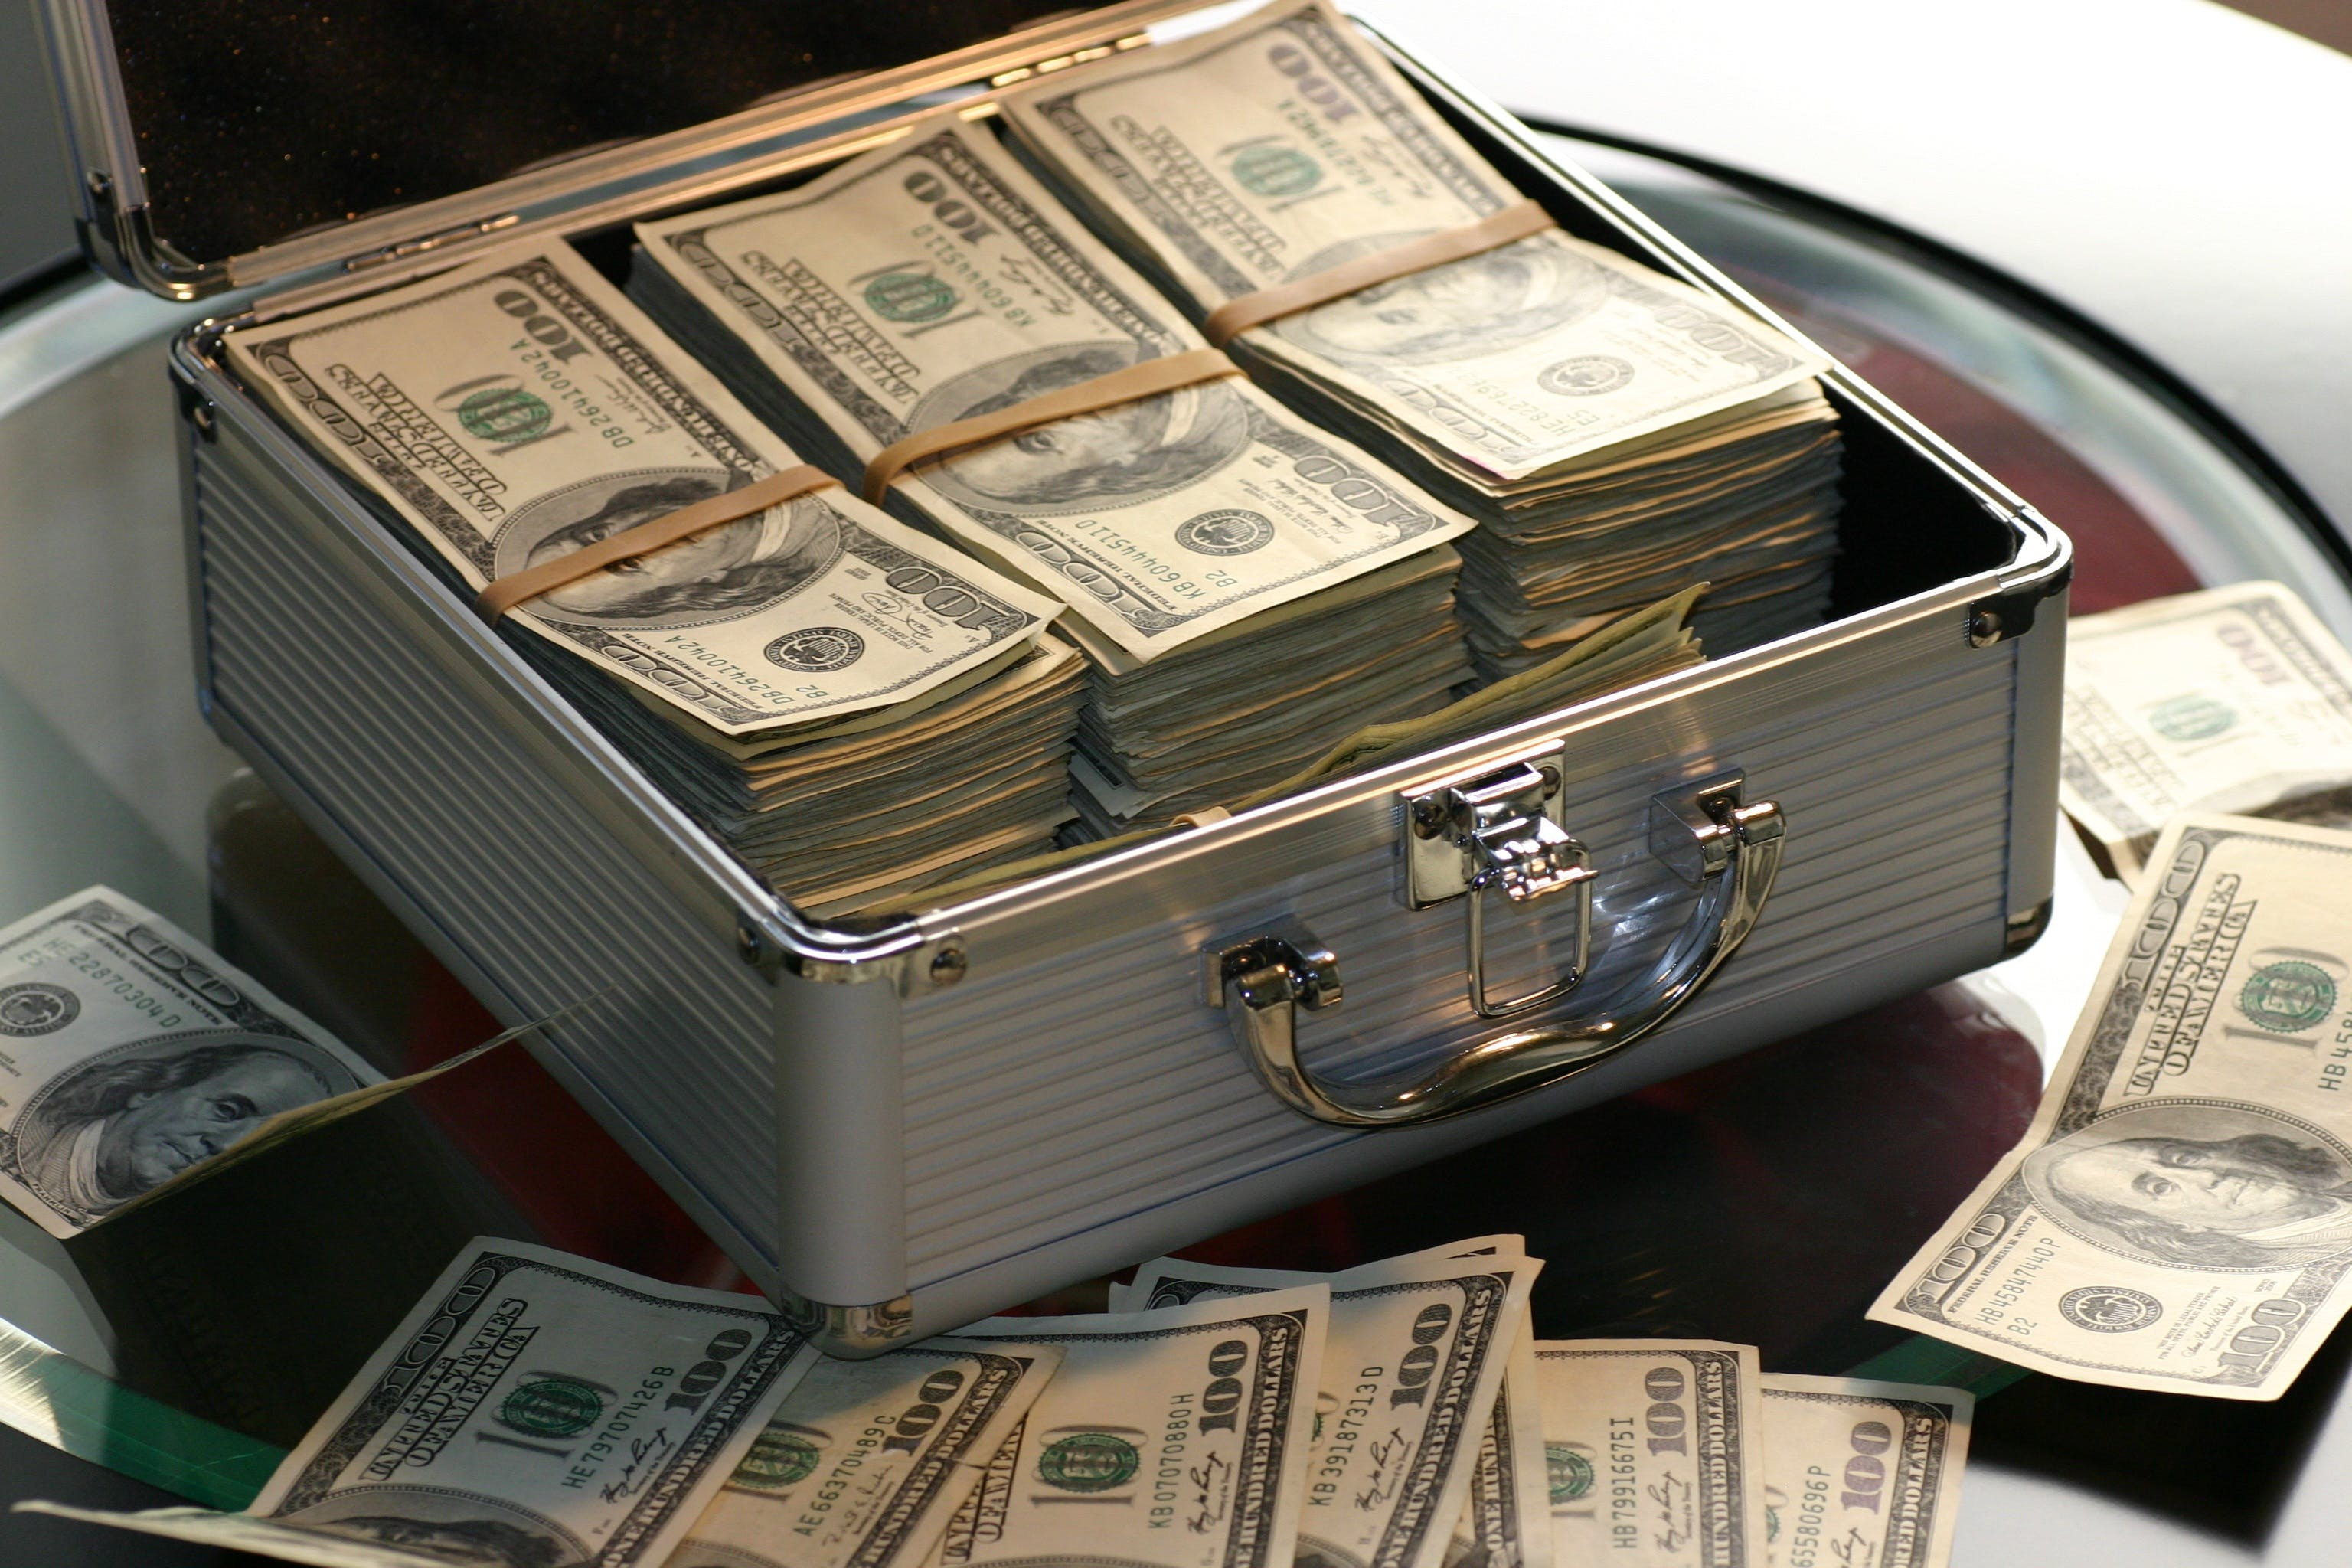 bancário, banco, bolsa